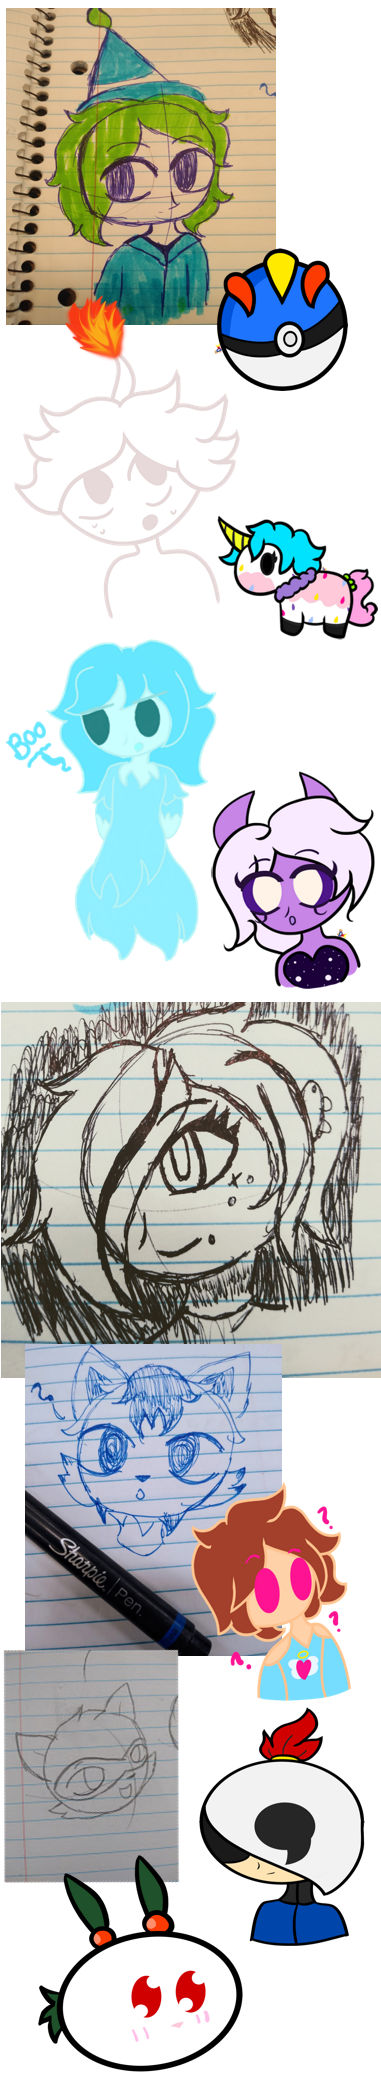 Dump Sketch19 03